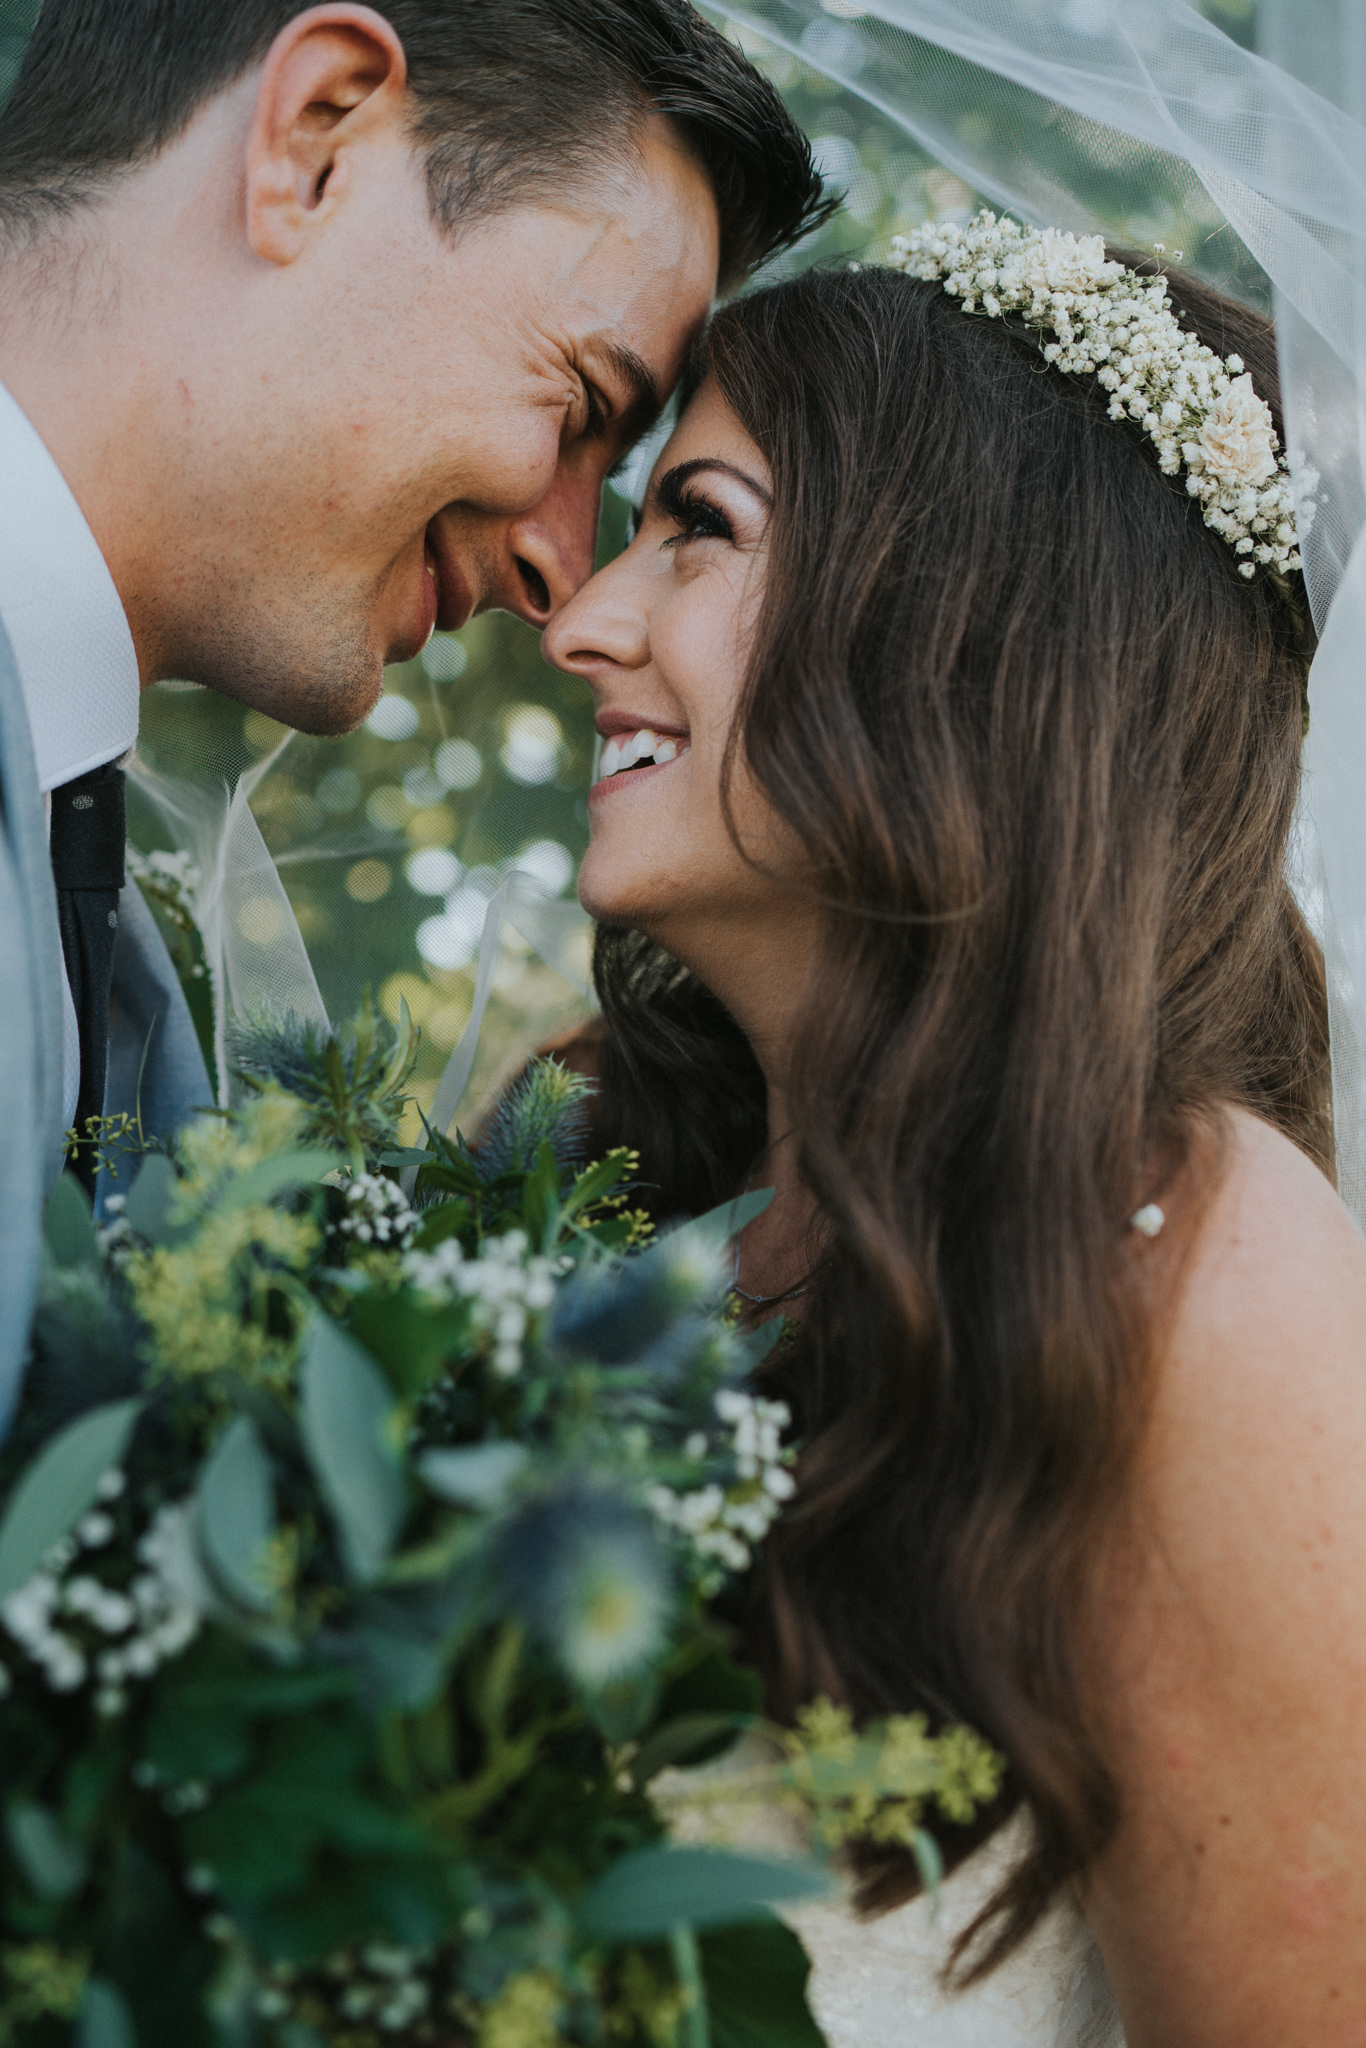 Sophie-Christian-Prested-Hall-Grace-Elizabeth-Previews-Essex-Norfolk-Suffolk-Devon-Alternative-Wedding-Photographer (15 of 20).jpg